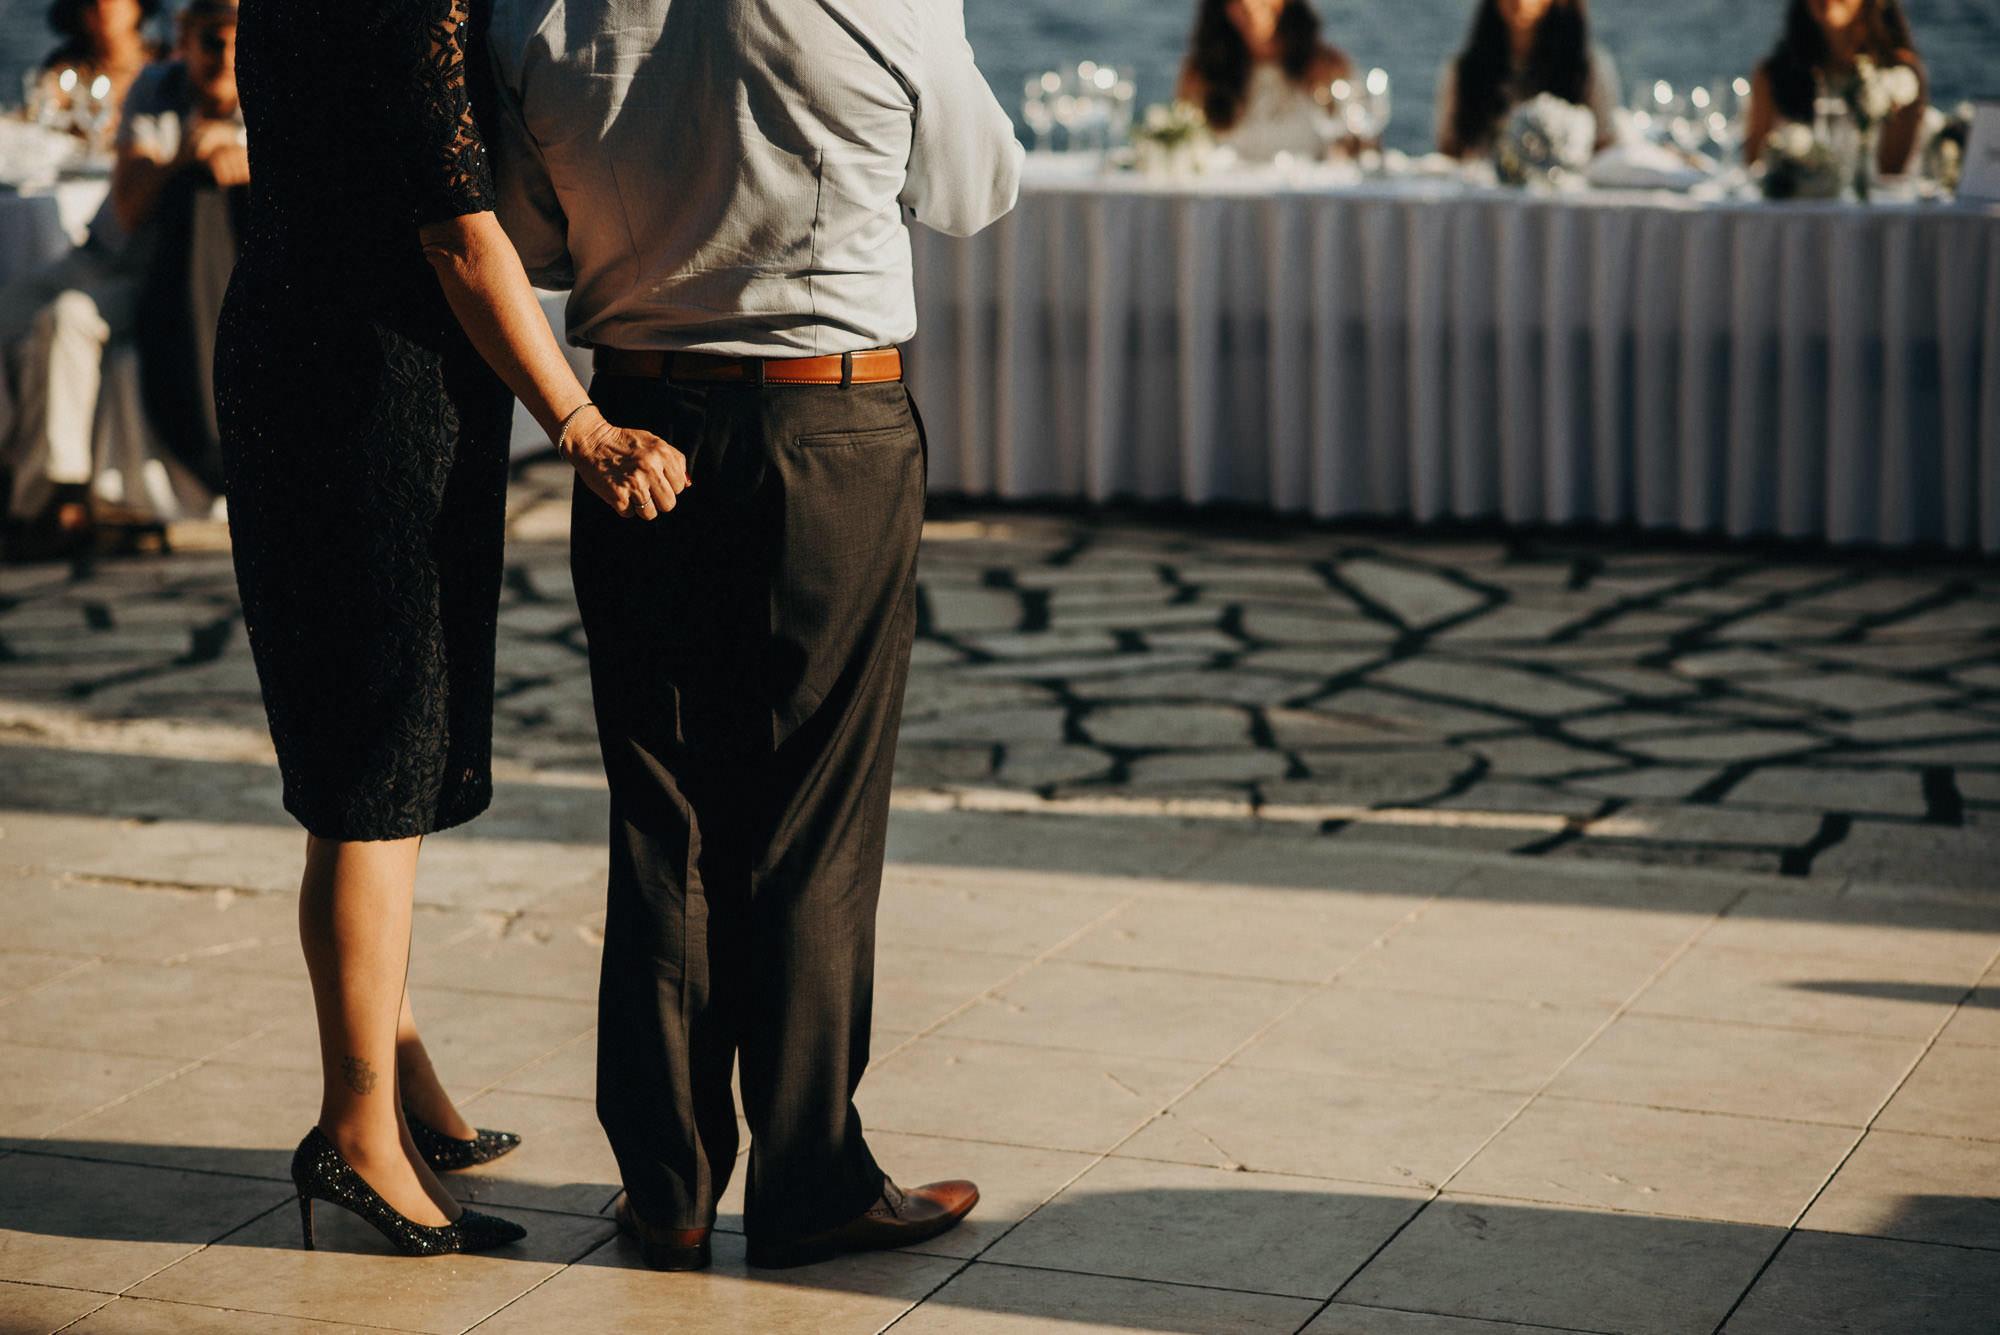 dubrovnik_croatia_wedding_photographer-jere_satamo-destination_weddings-059-web.jpg